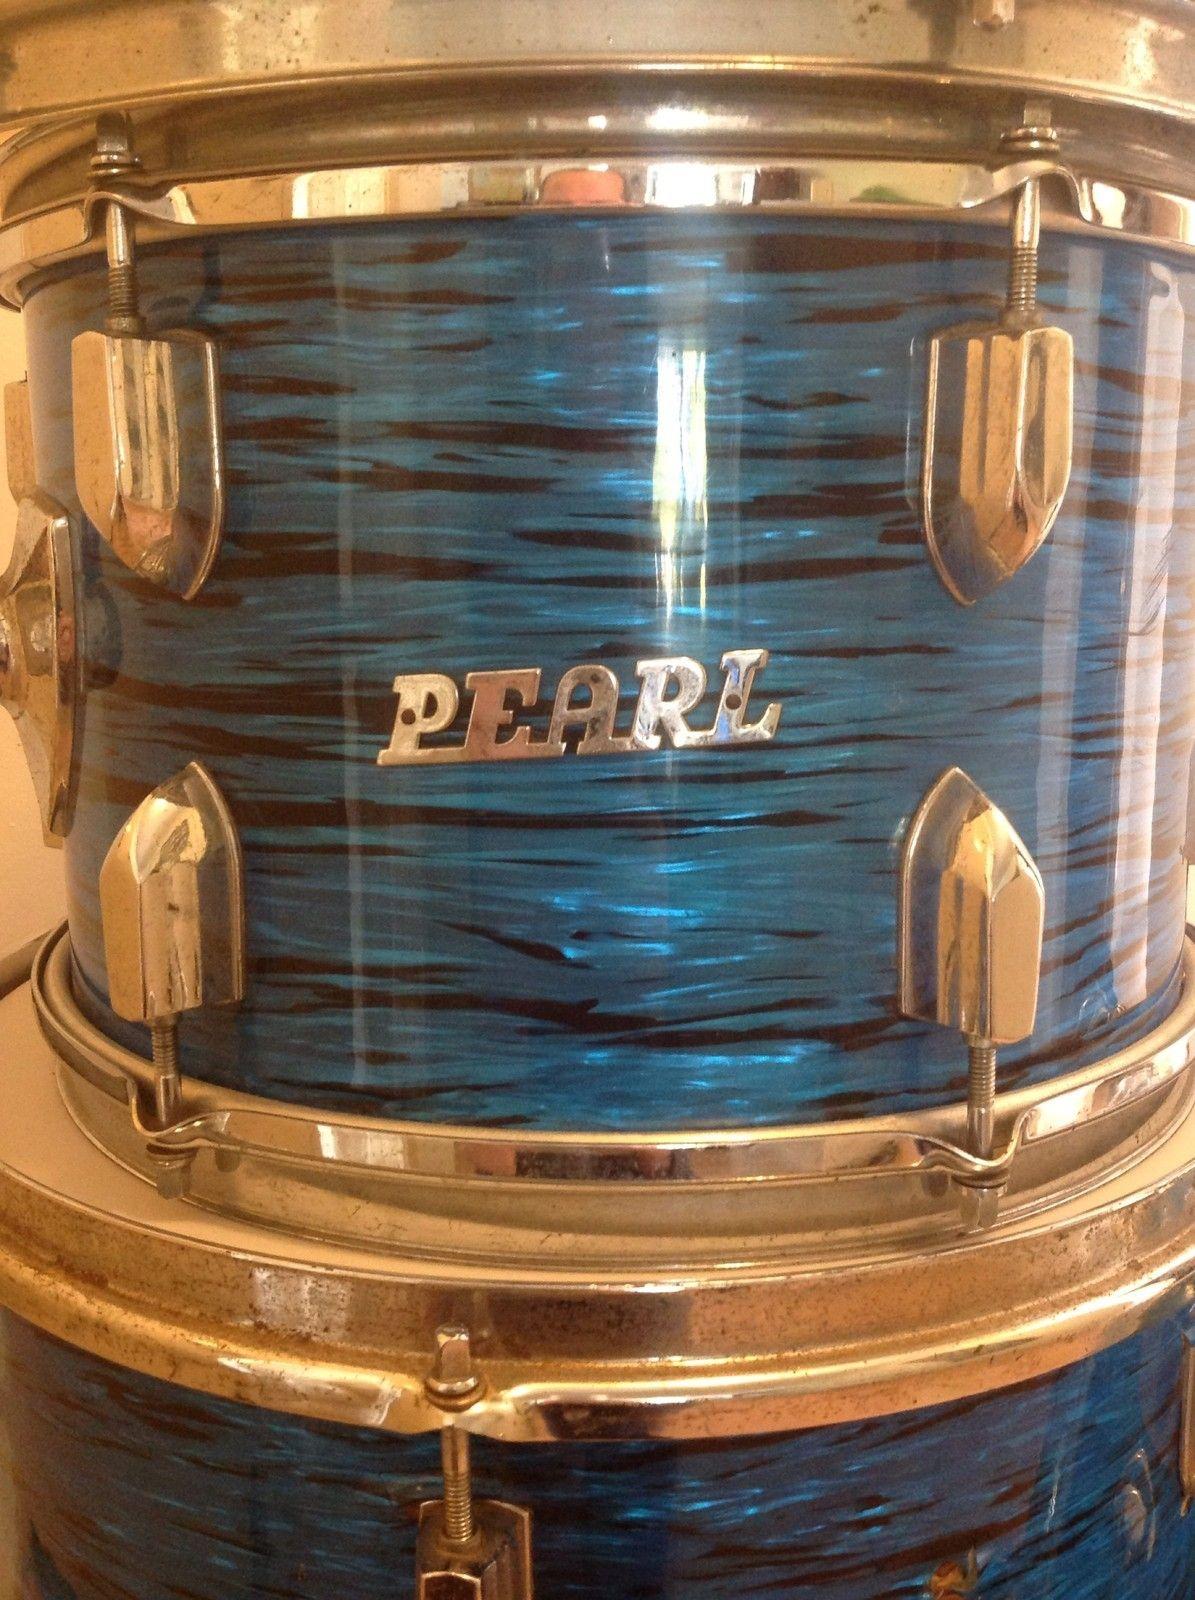 Pearl Vintage Drum Kit 1960's Era Jazz Kit 20 12 14 14  Ebay